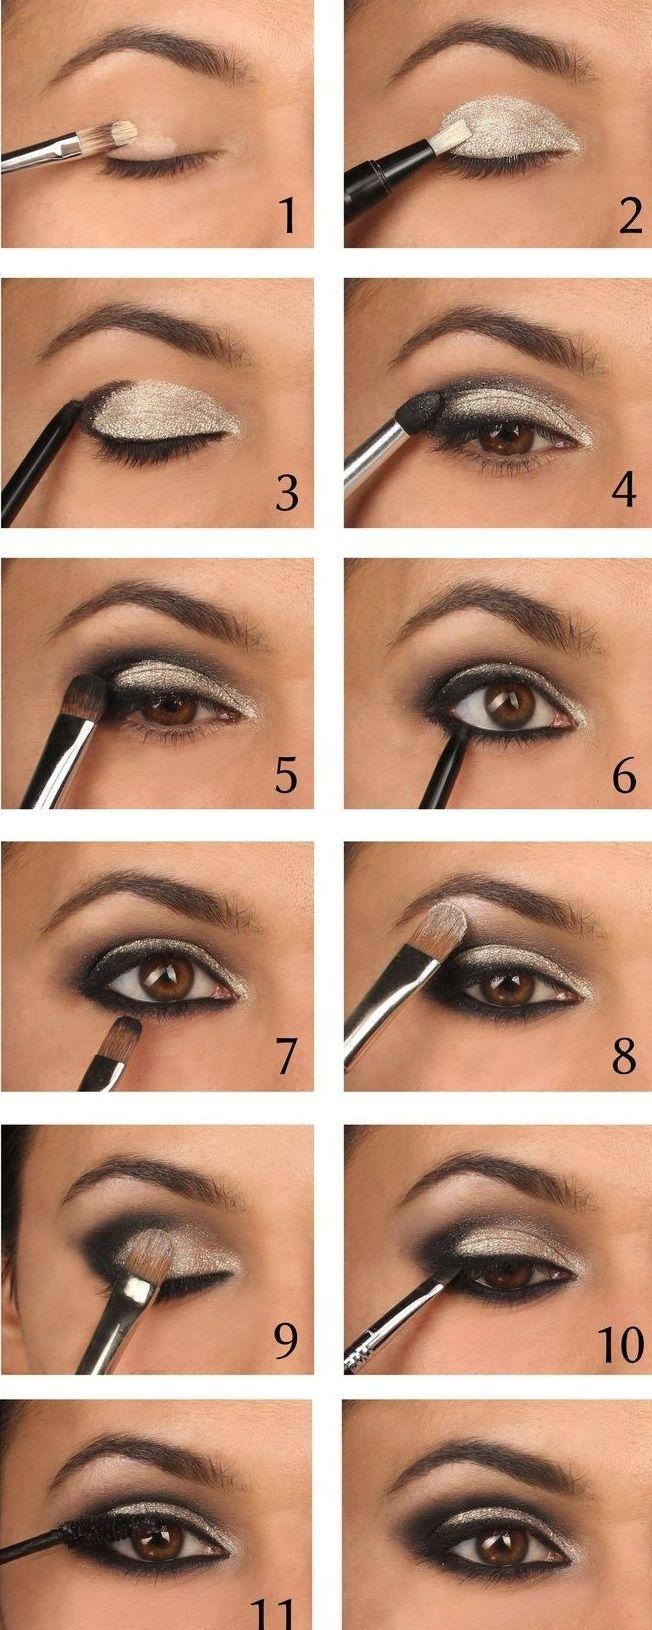 40 Hottest Smokey Eye Makeup Ideas 2020 & Smokey Eye with Smokey Eye Makeup Steps With Pictures